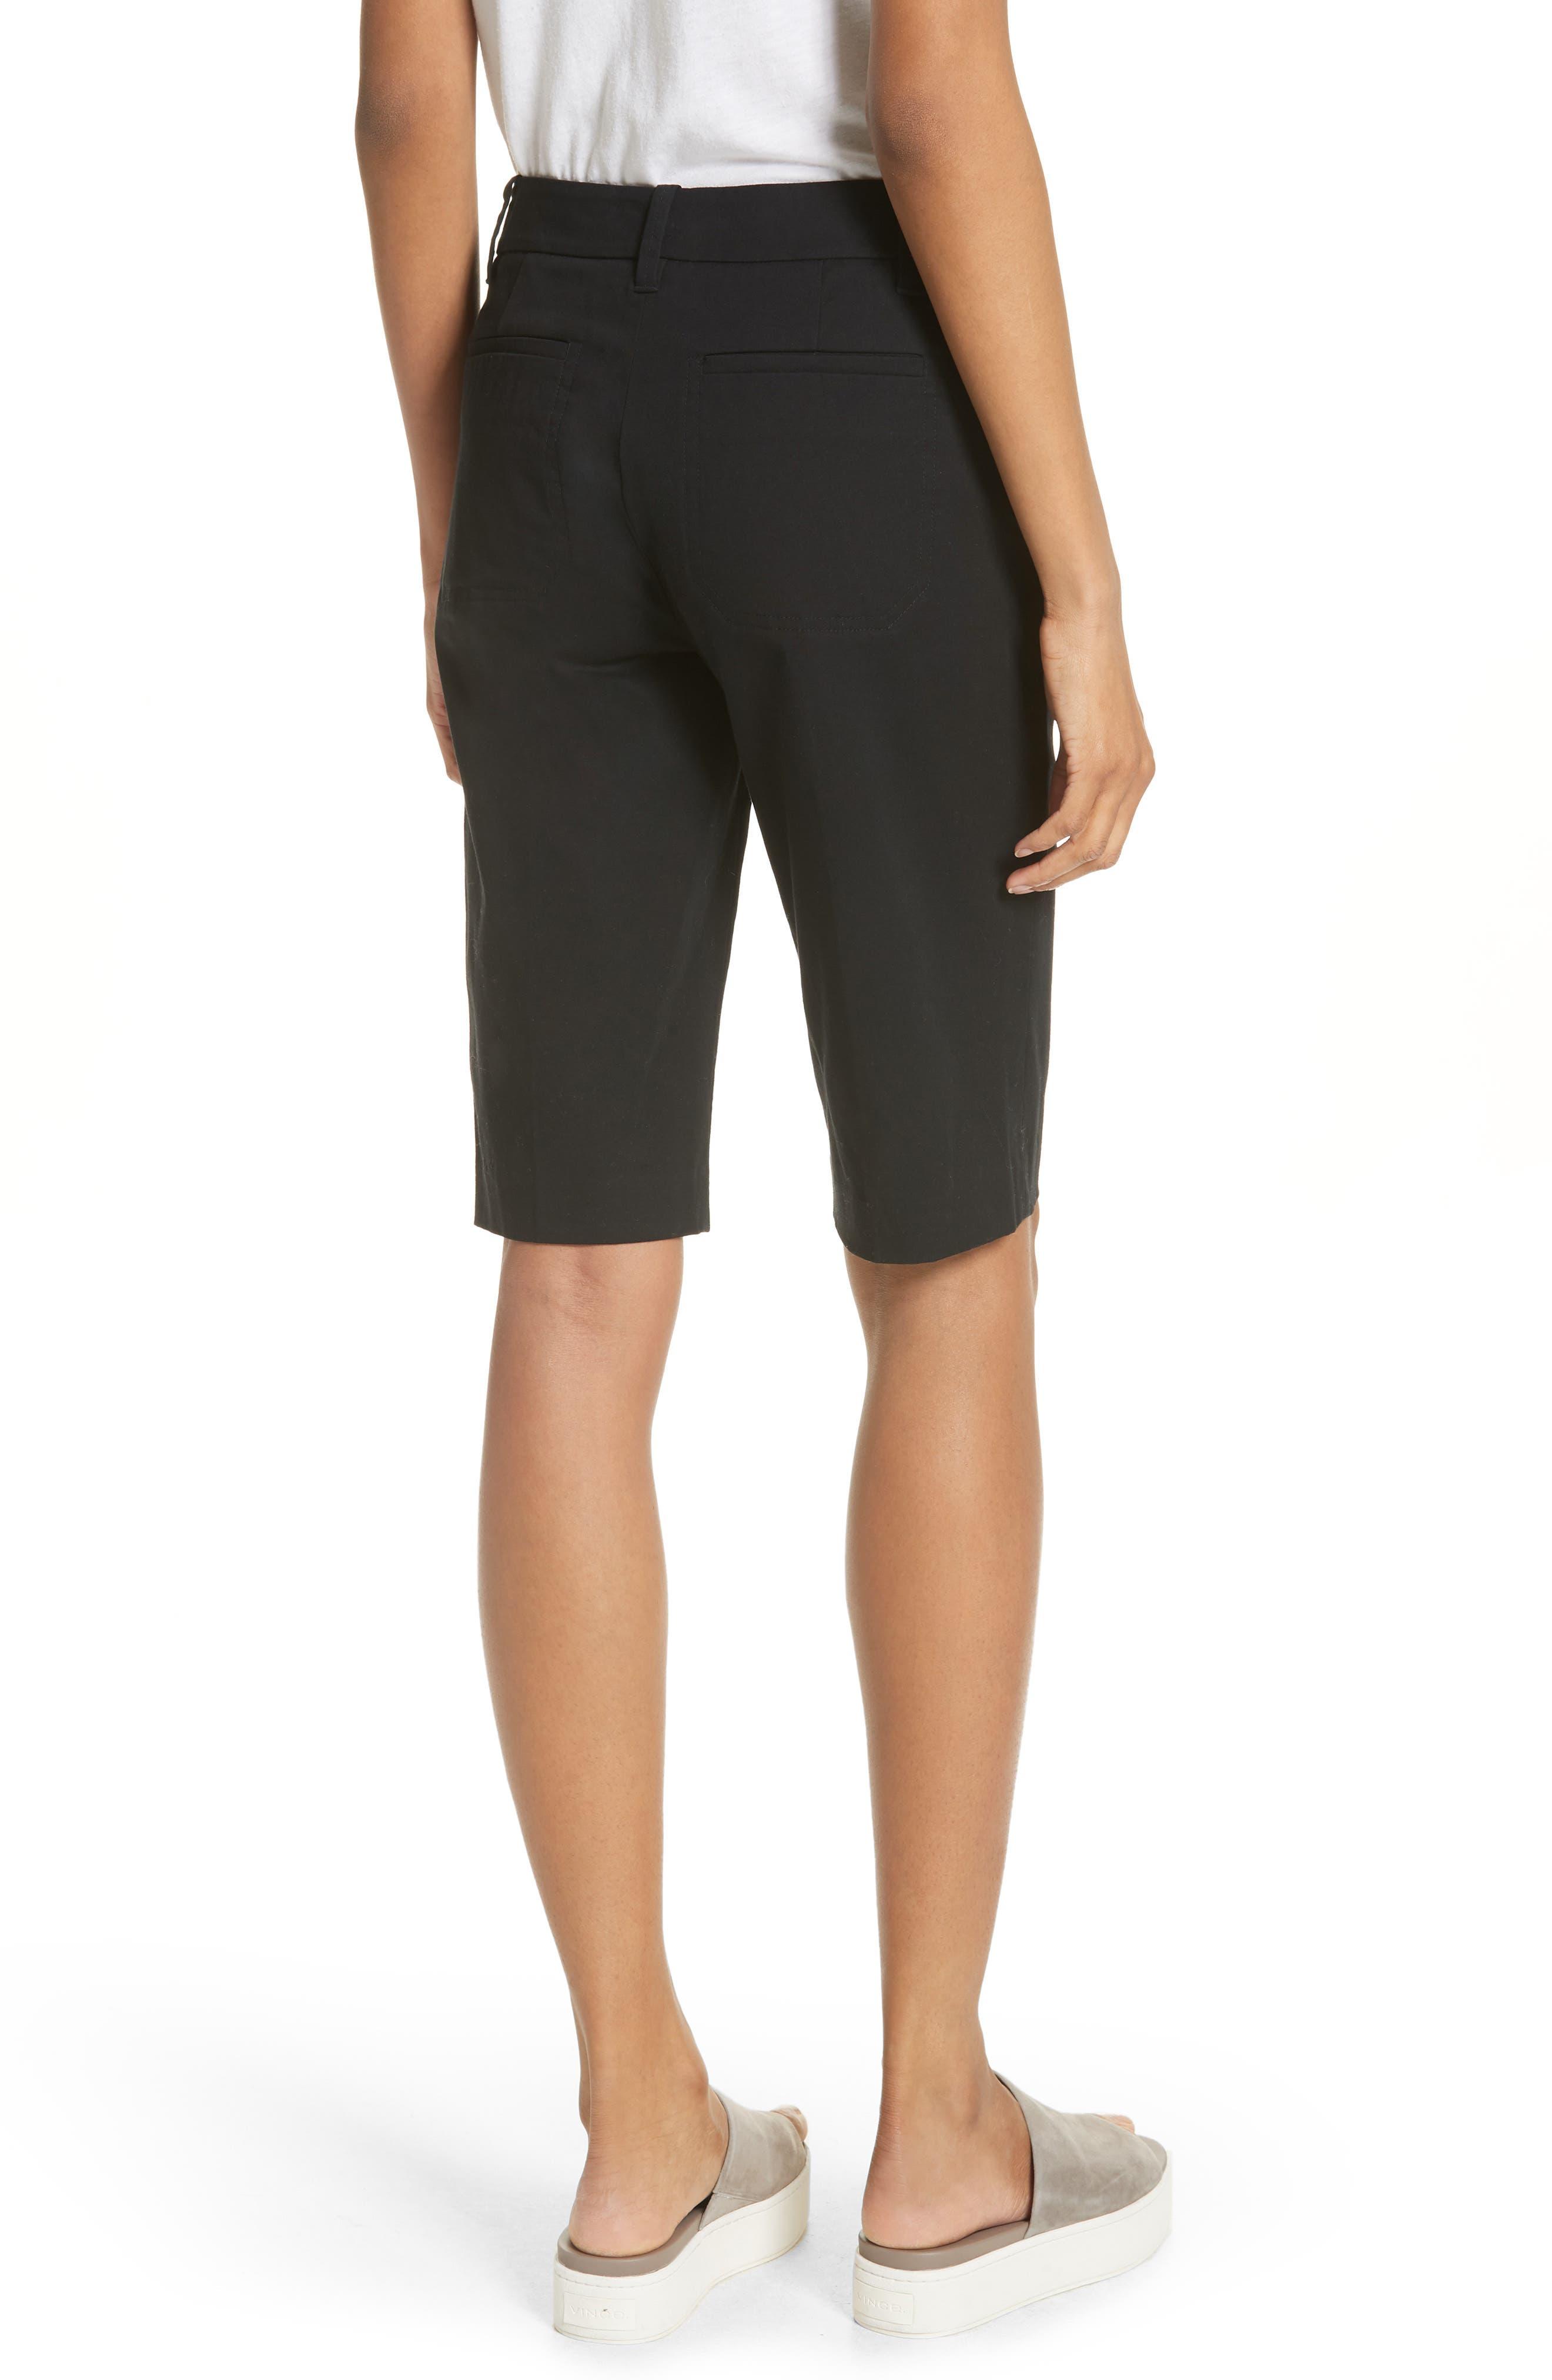 Bermuda Shorts,                             Alternate thumbnail 2, color,                             Black